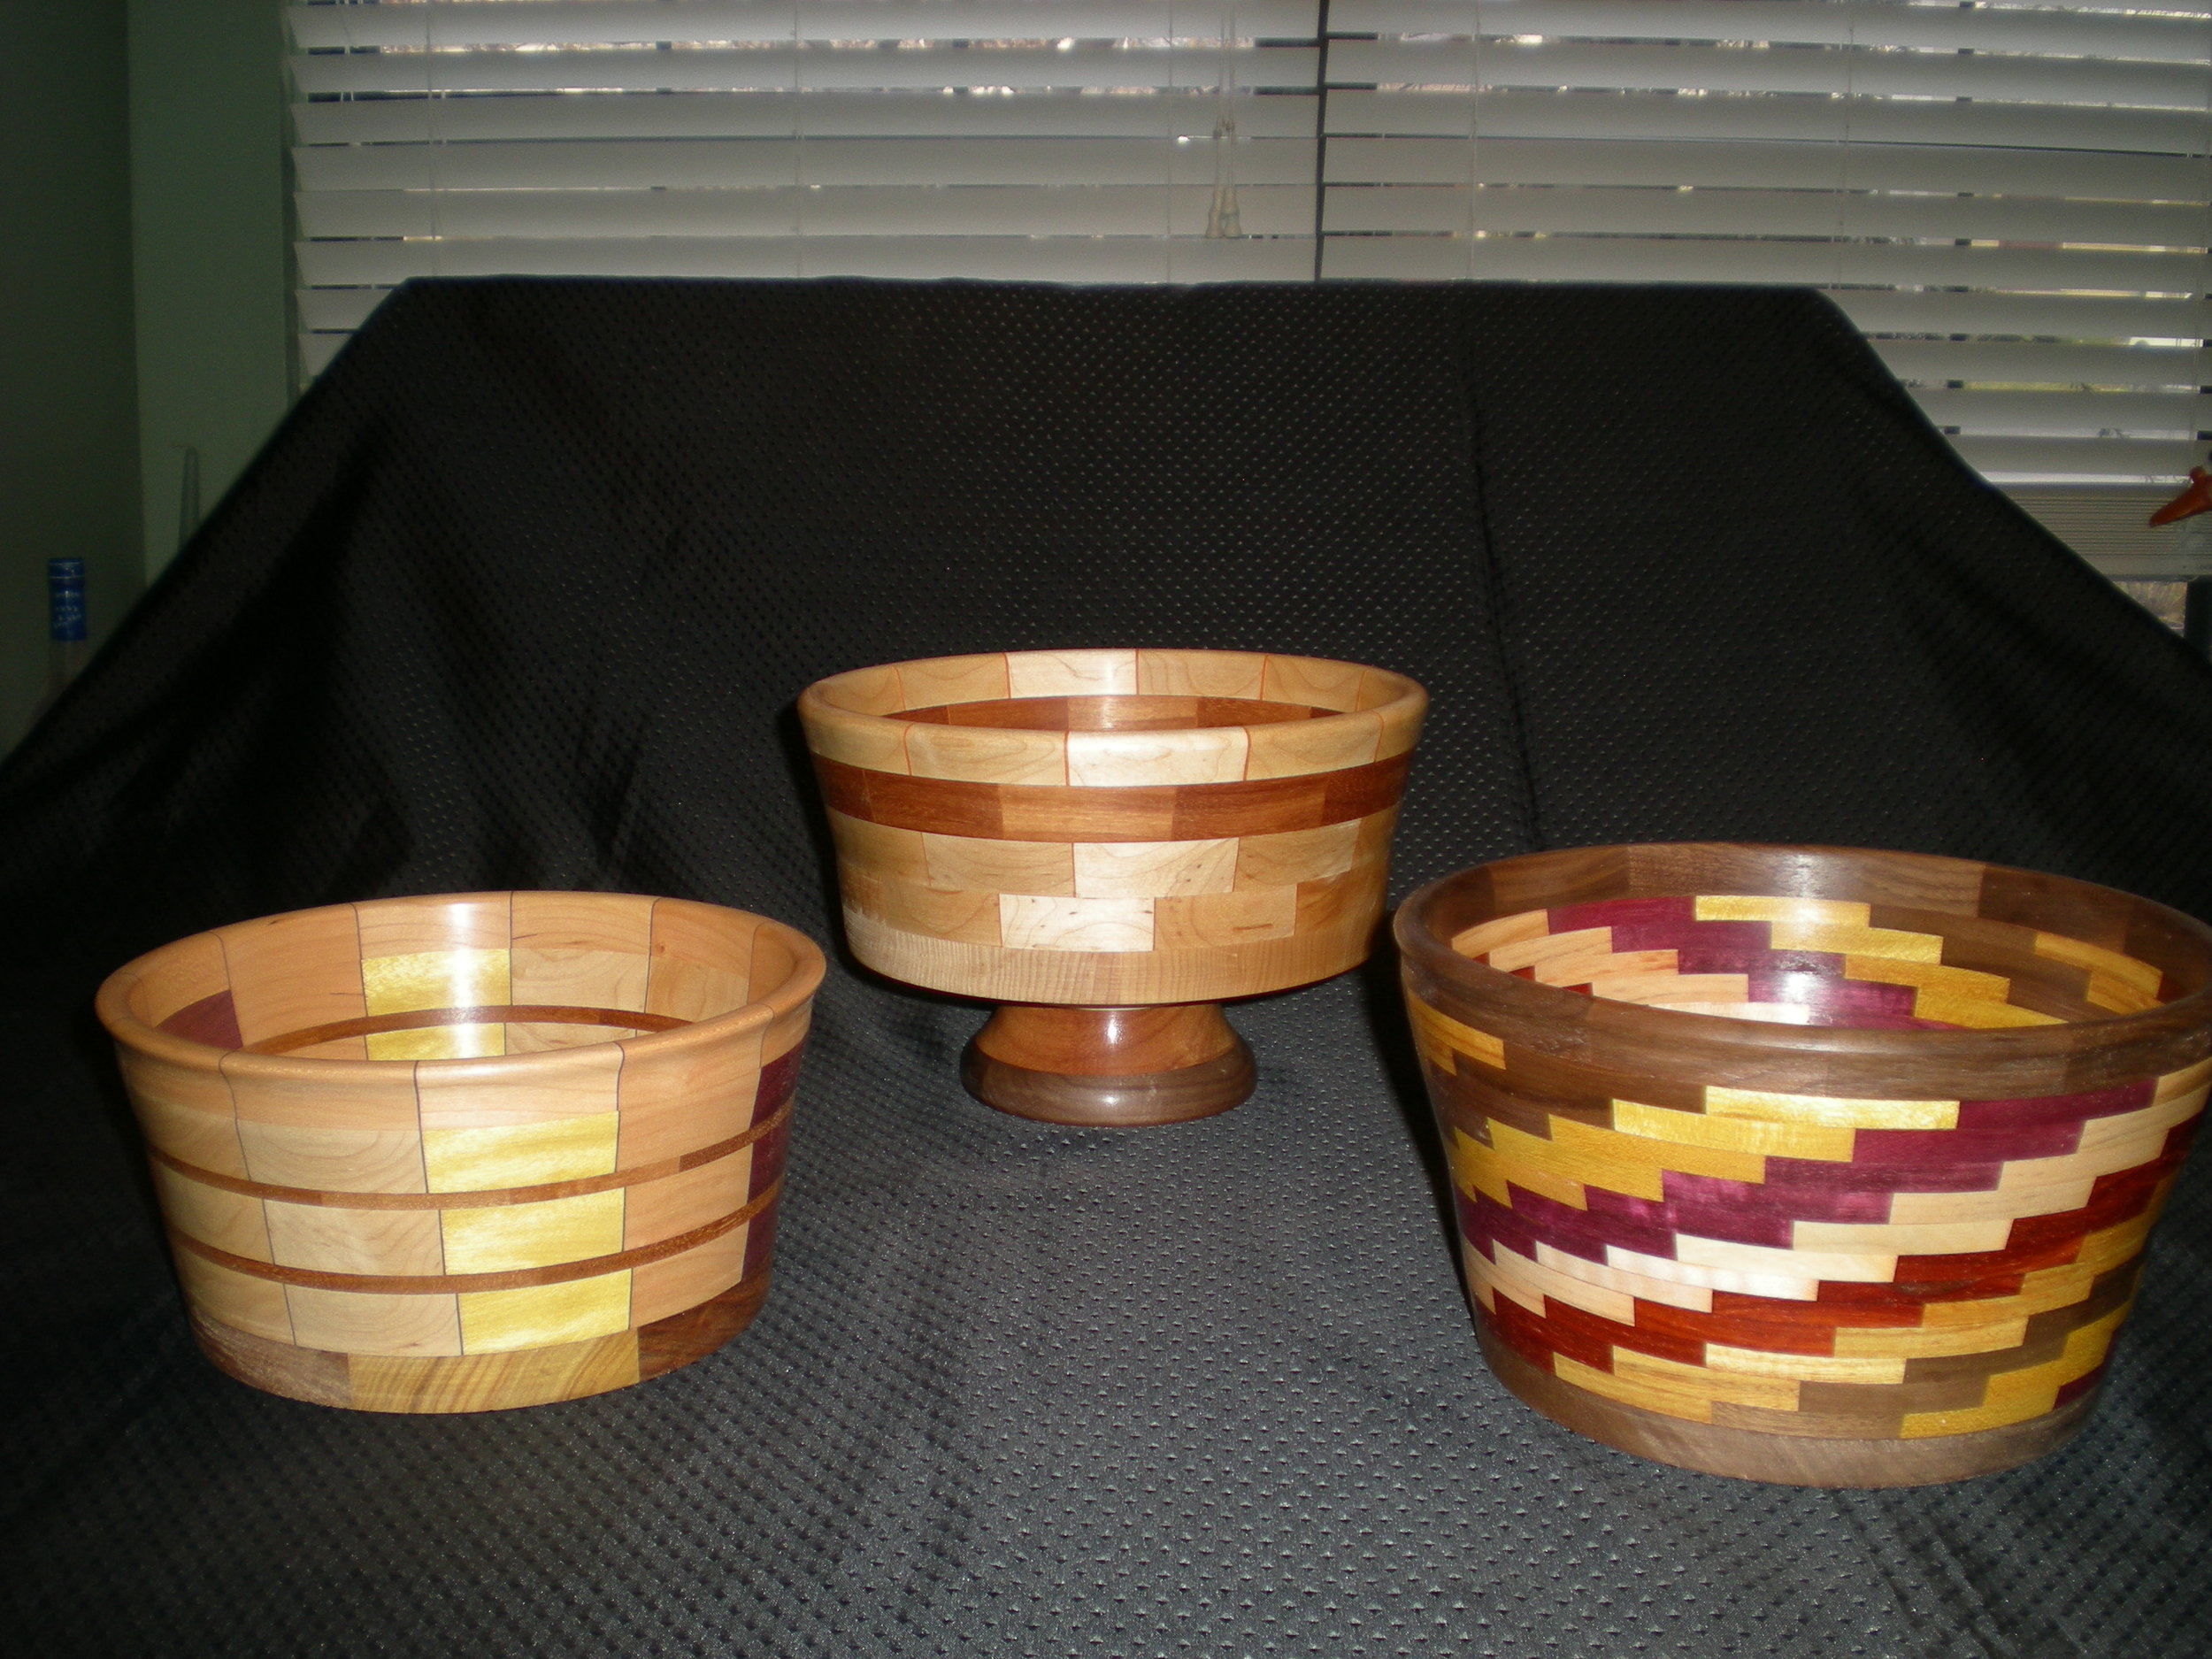 RJC Wood Creations - Bowls (25).JPG